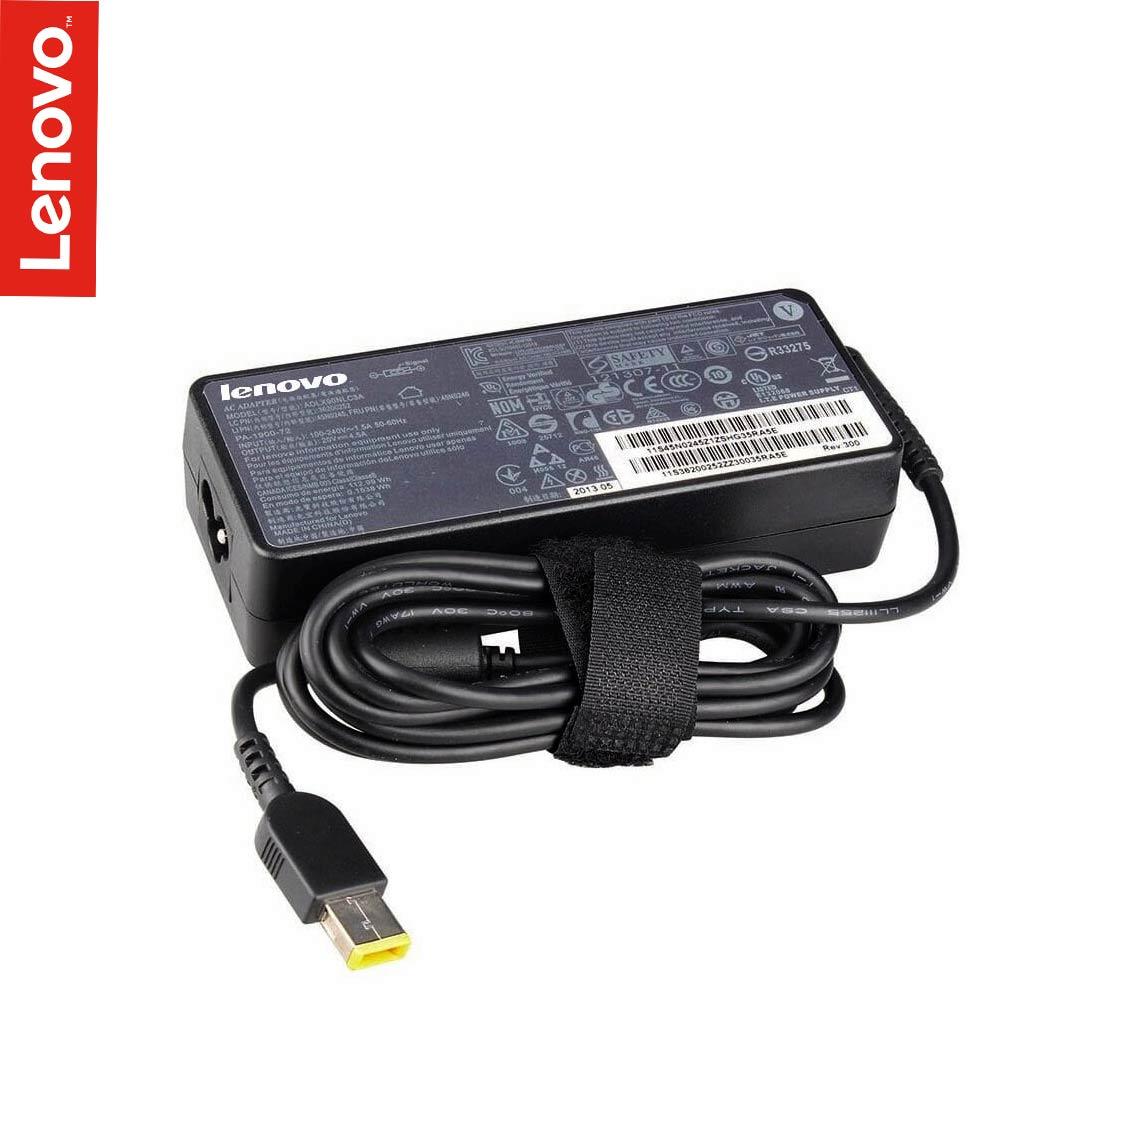 آداپتور لپ تاپ لنوو 20v 4.5a مدل ThinkPad USB